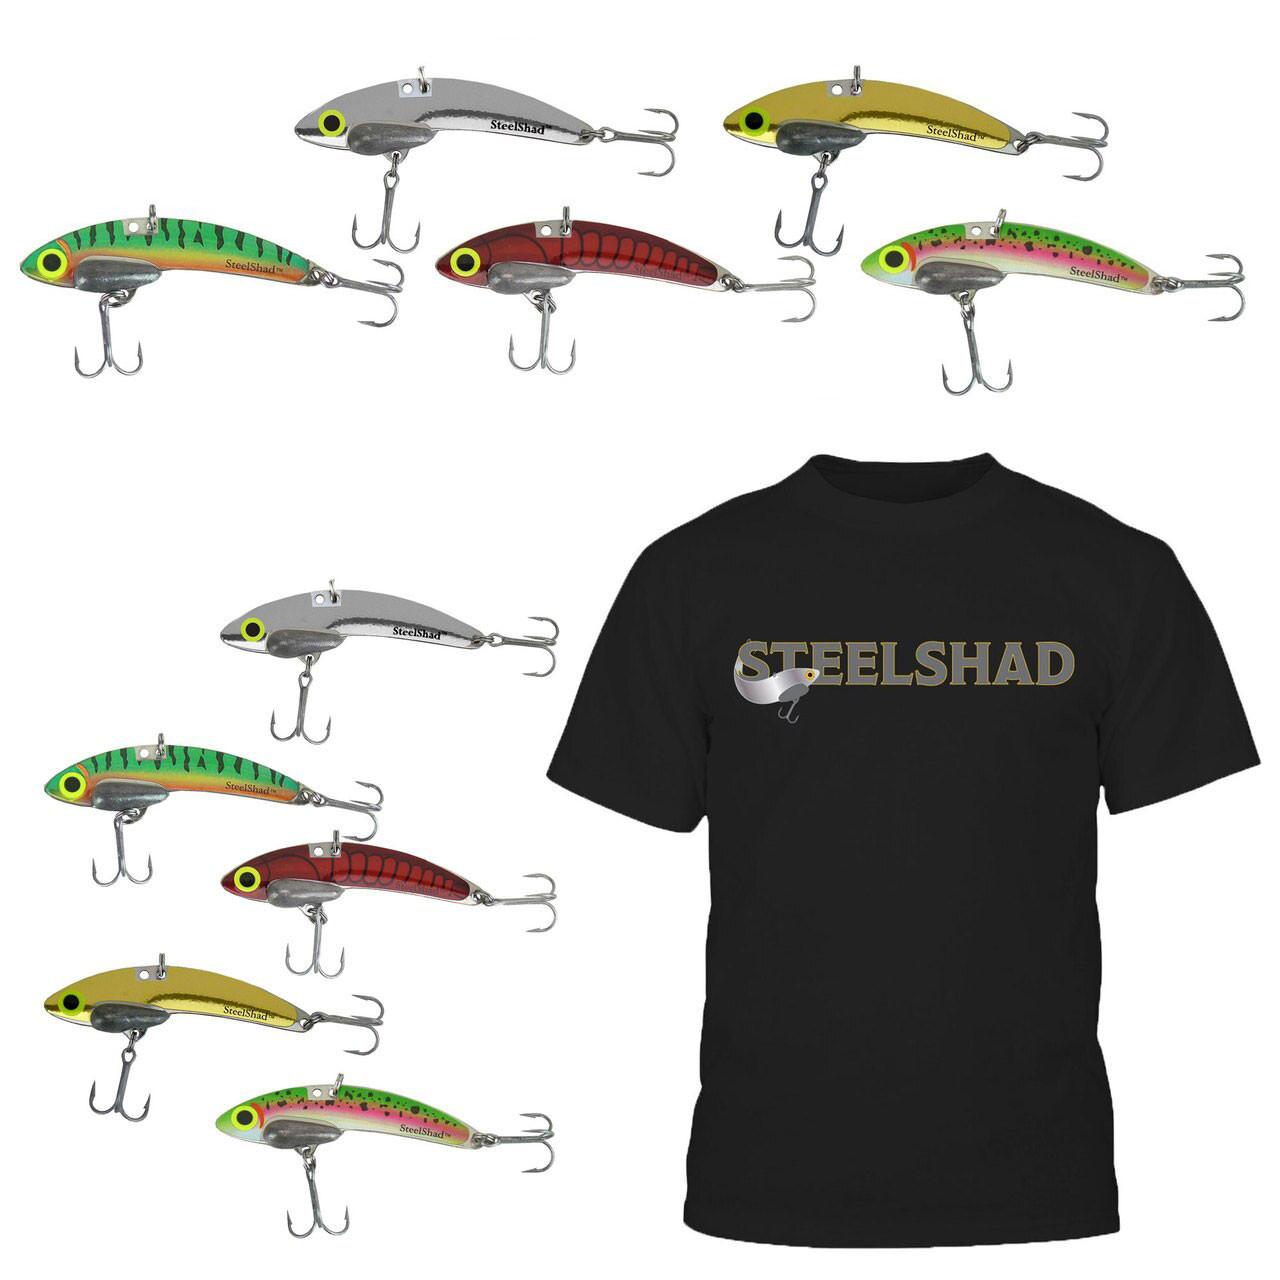 SteelShad Lunker Gift Pack